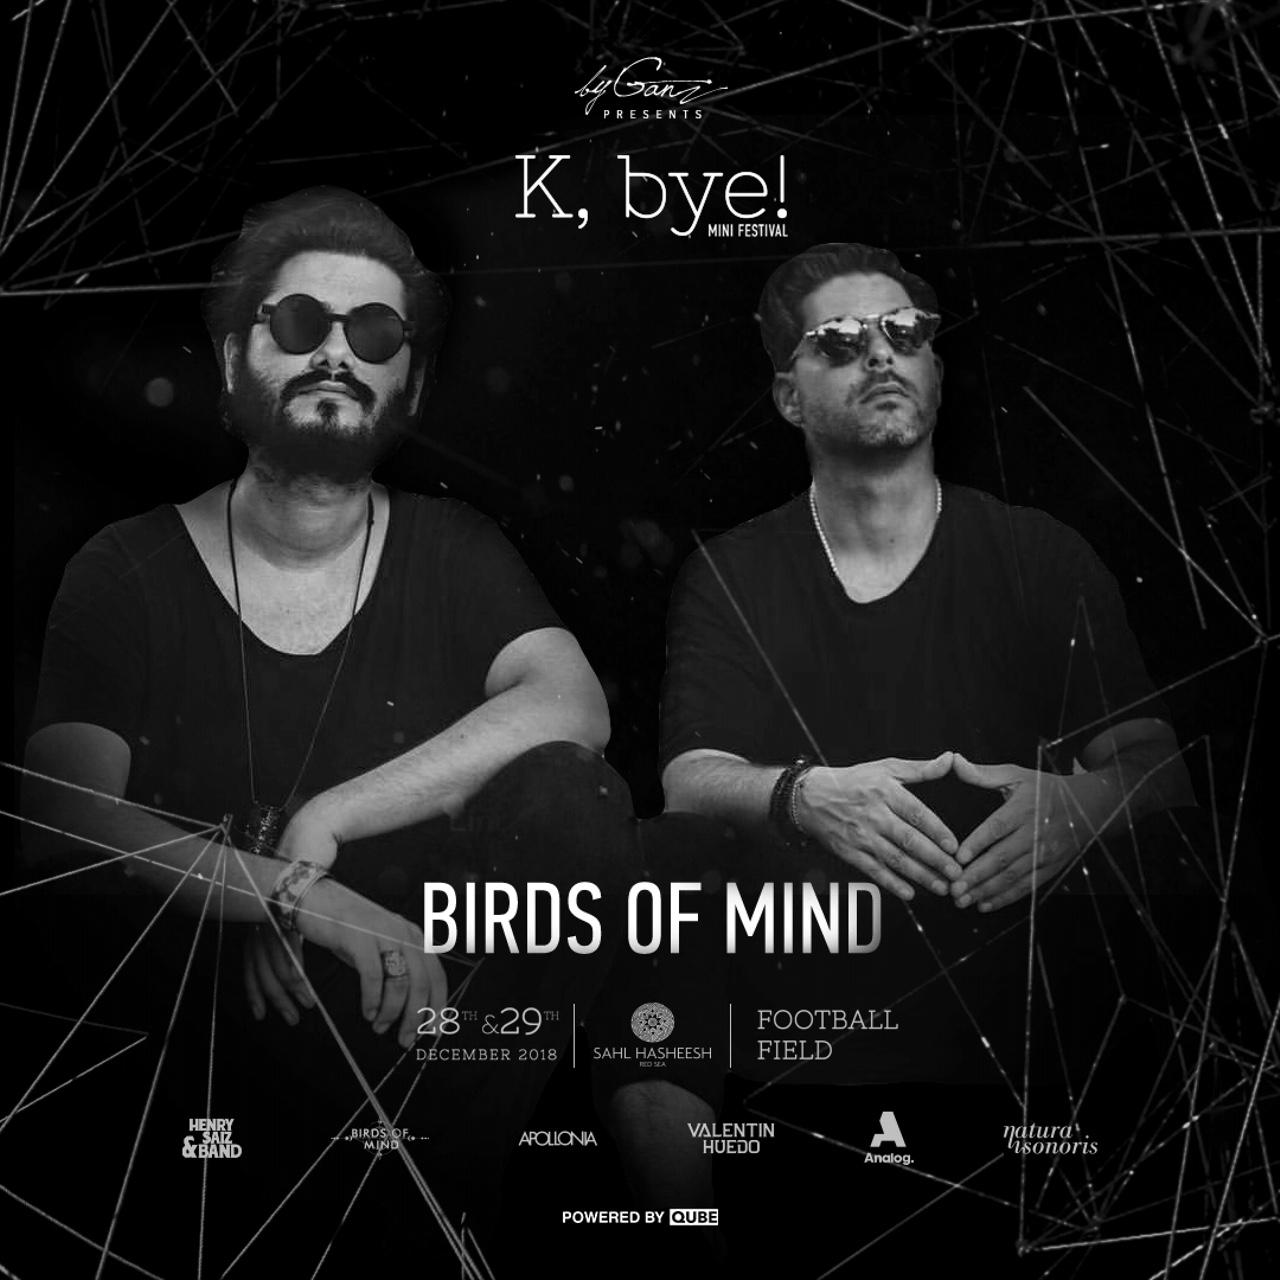 K,bye! Weekend Sahl Hasheesh Egypt Birds of Mind byganz 2018